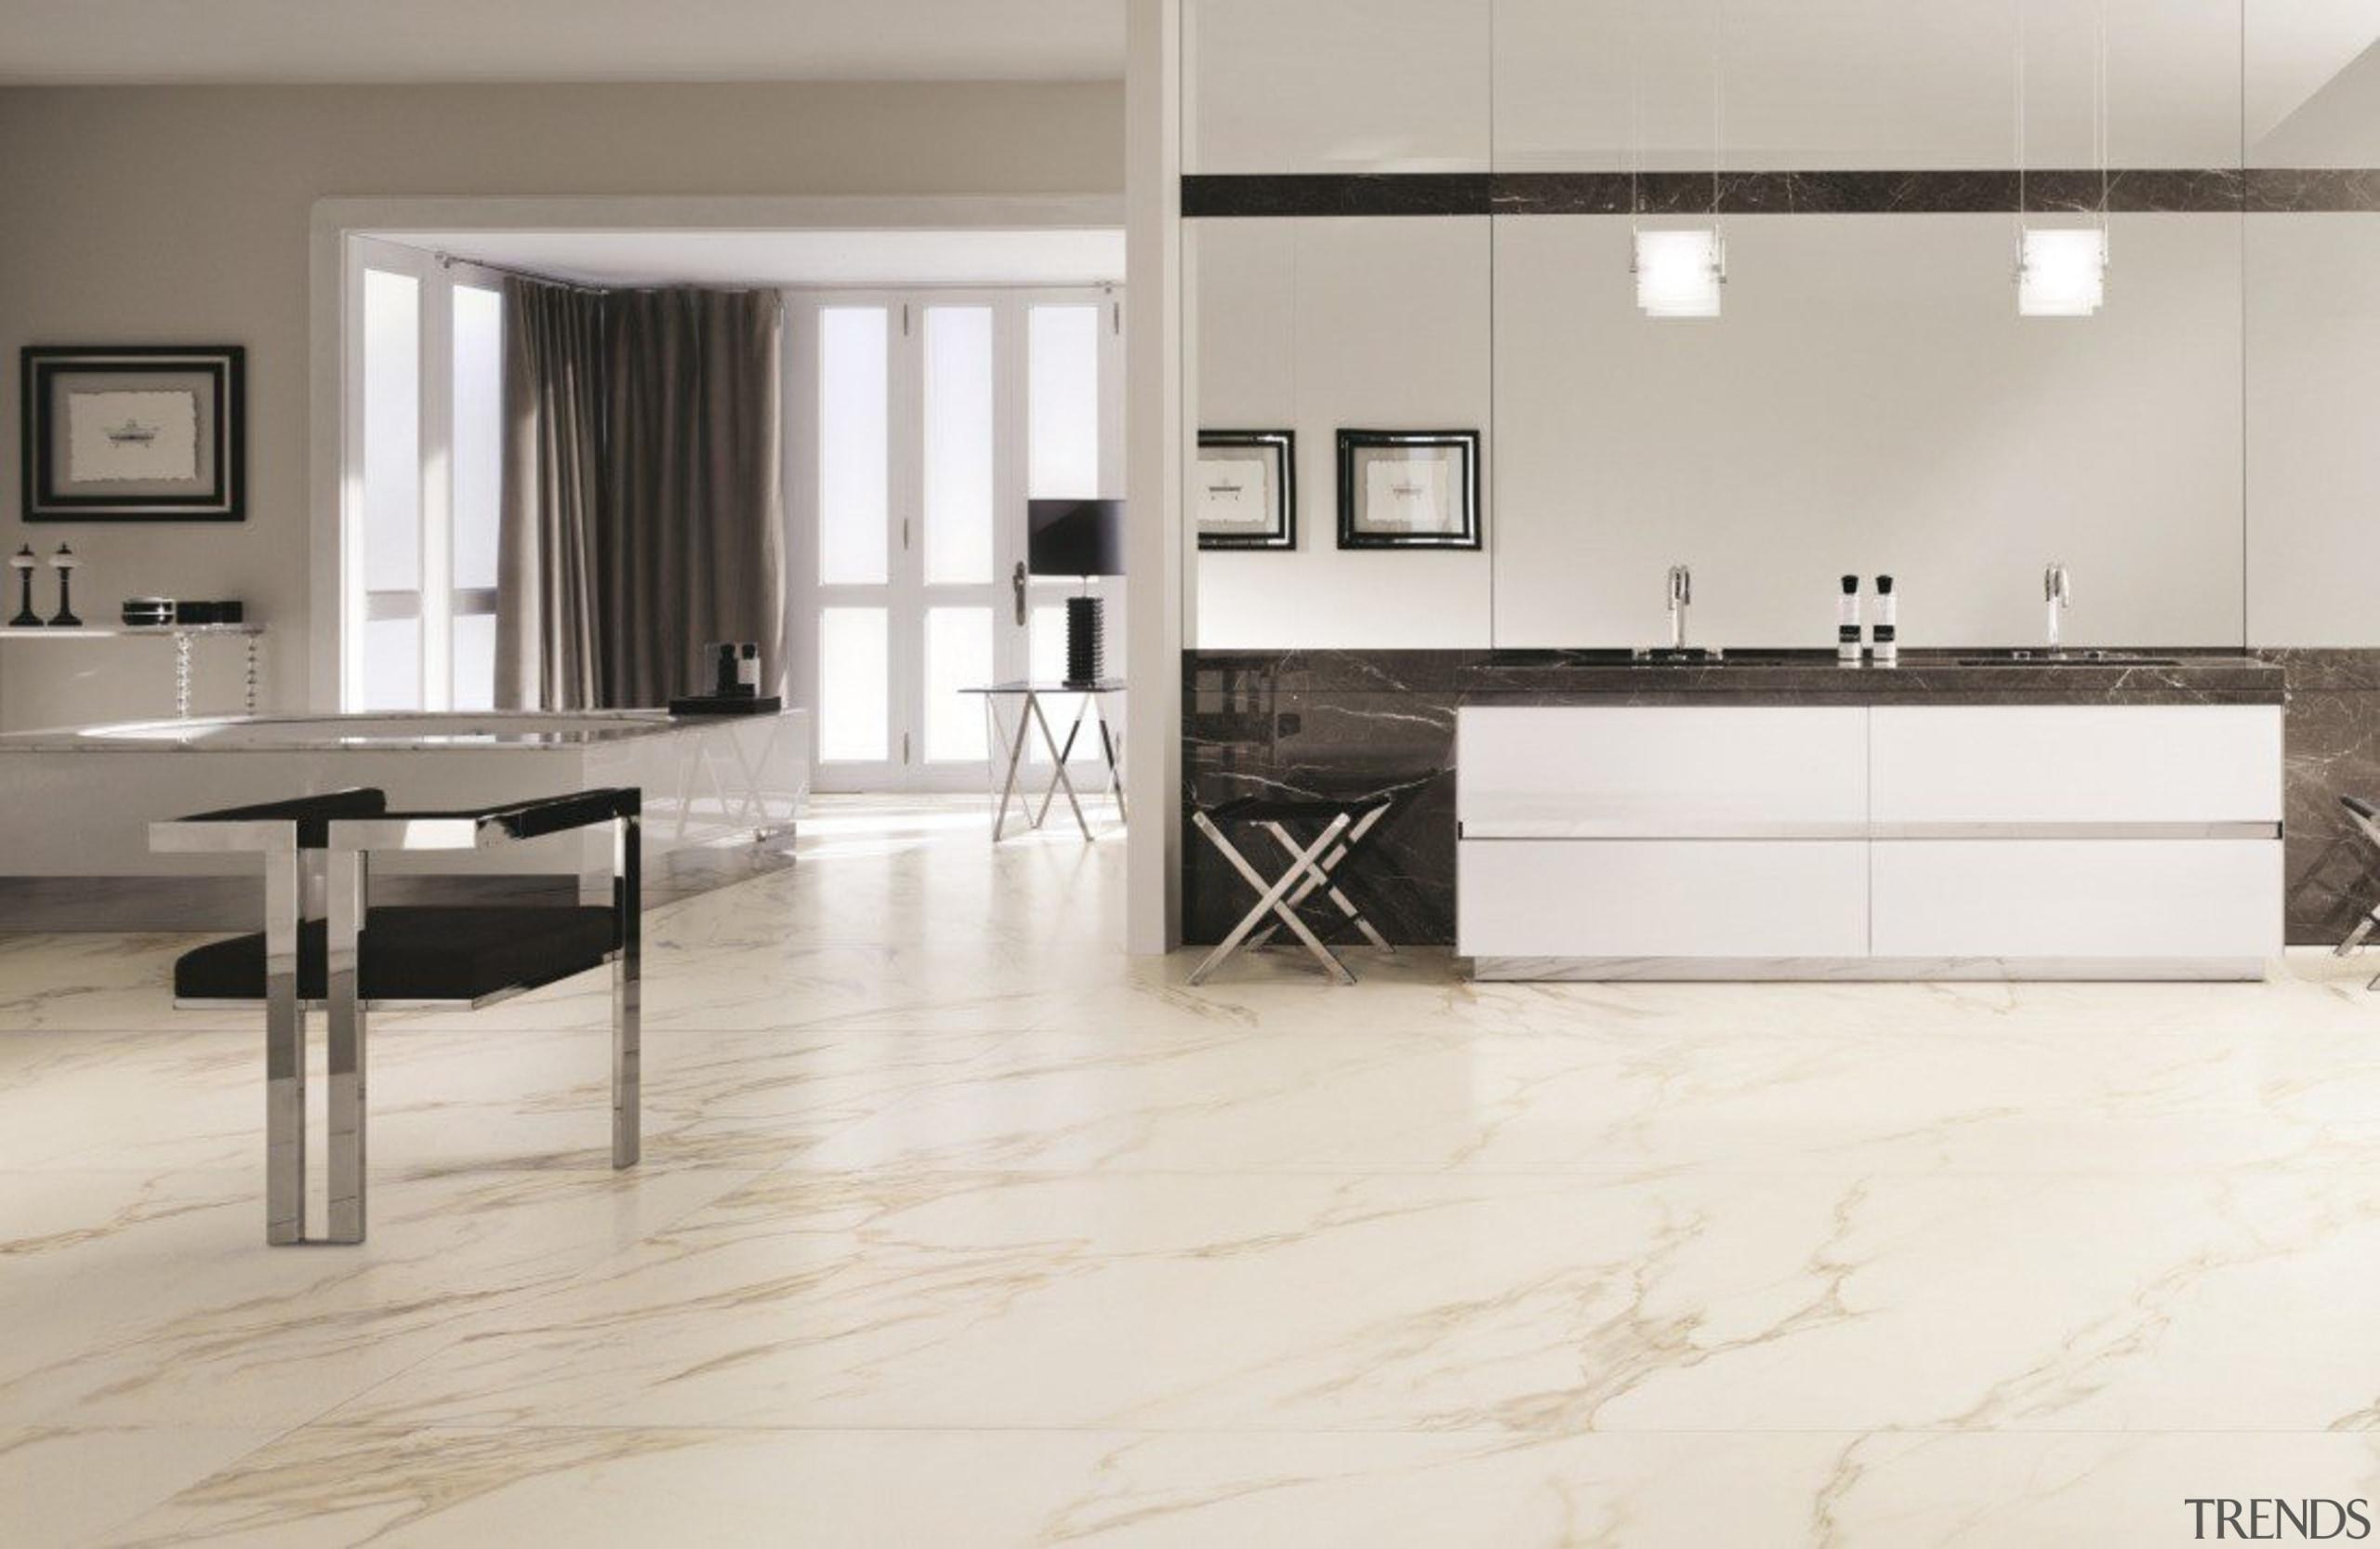 Keralite by Cotto D'Este - Keralite by Cotto countertop, floor, flooring, furniture, hardwood, interior design, kitchen, laminate flooring, product design, tile, wall, wood, wood flooring, white